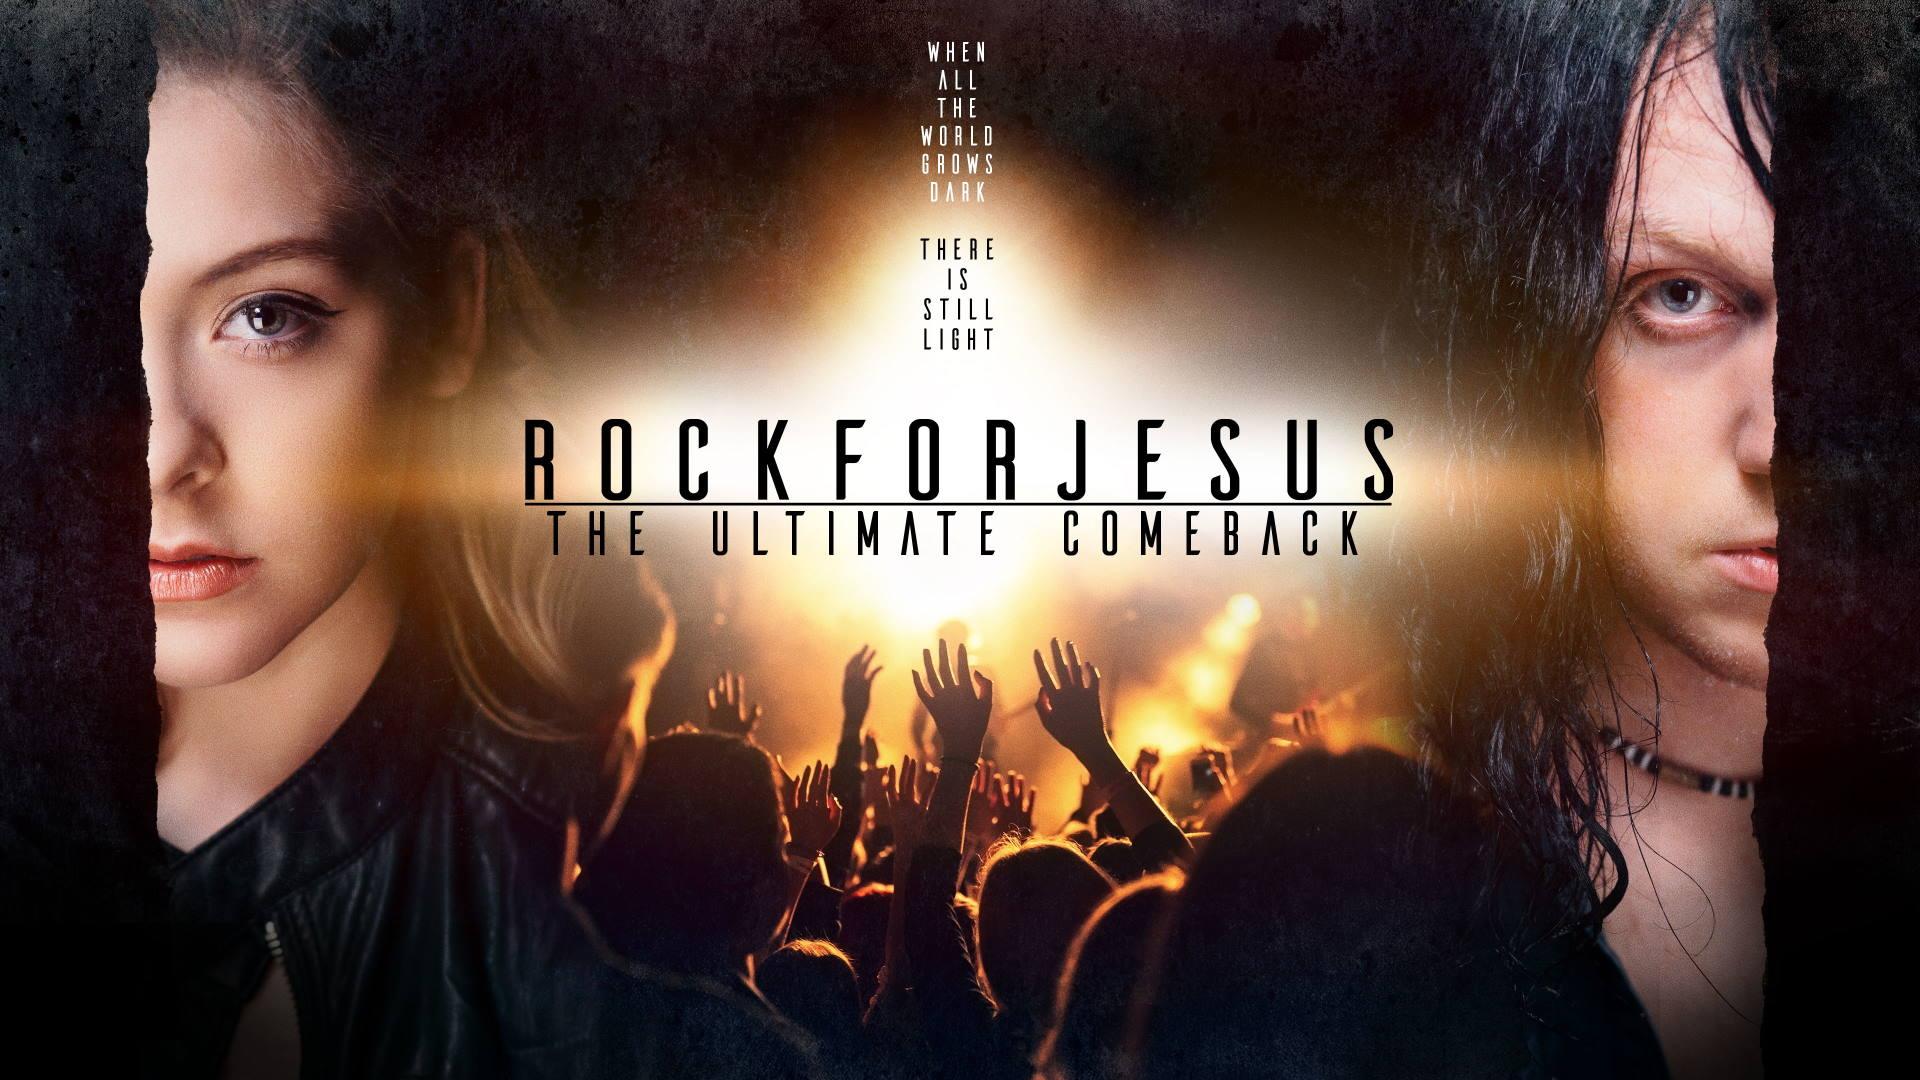 Rock For Jesus: The Ultimate Comeback